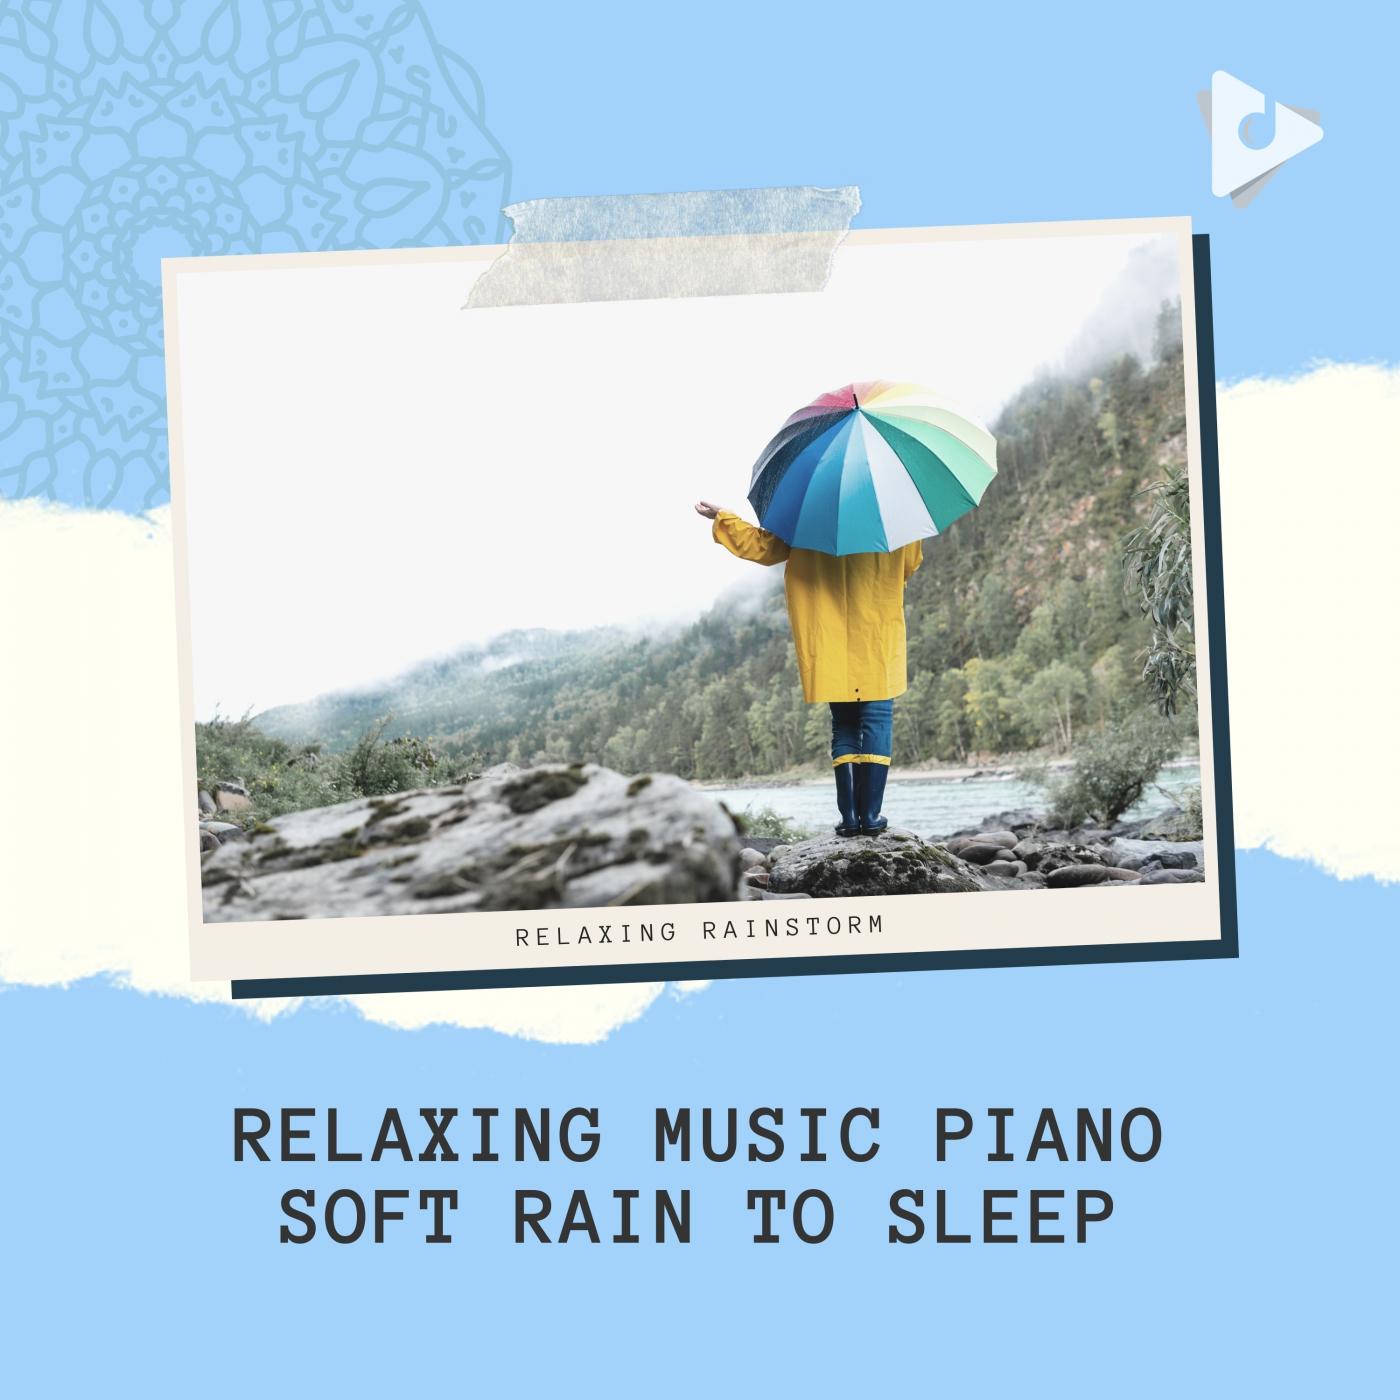 Relaxing Music Piano Soft Rain to Sleep